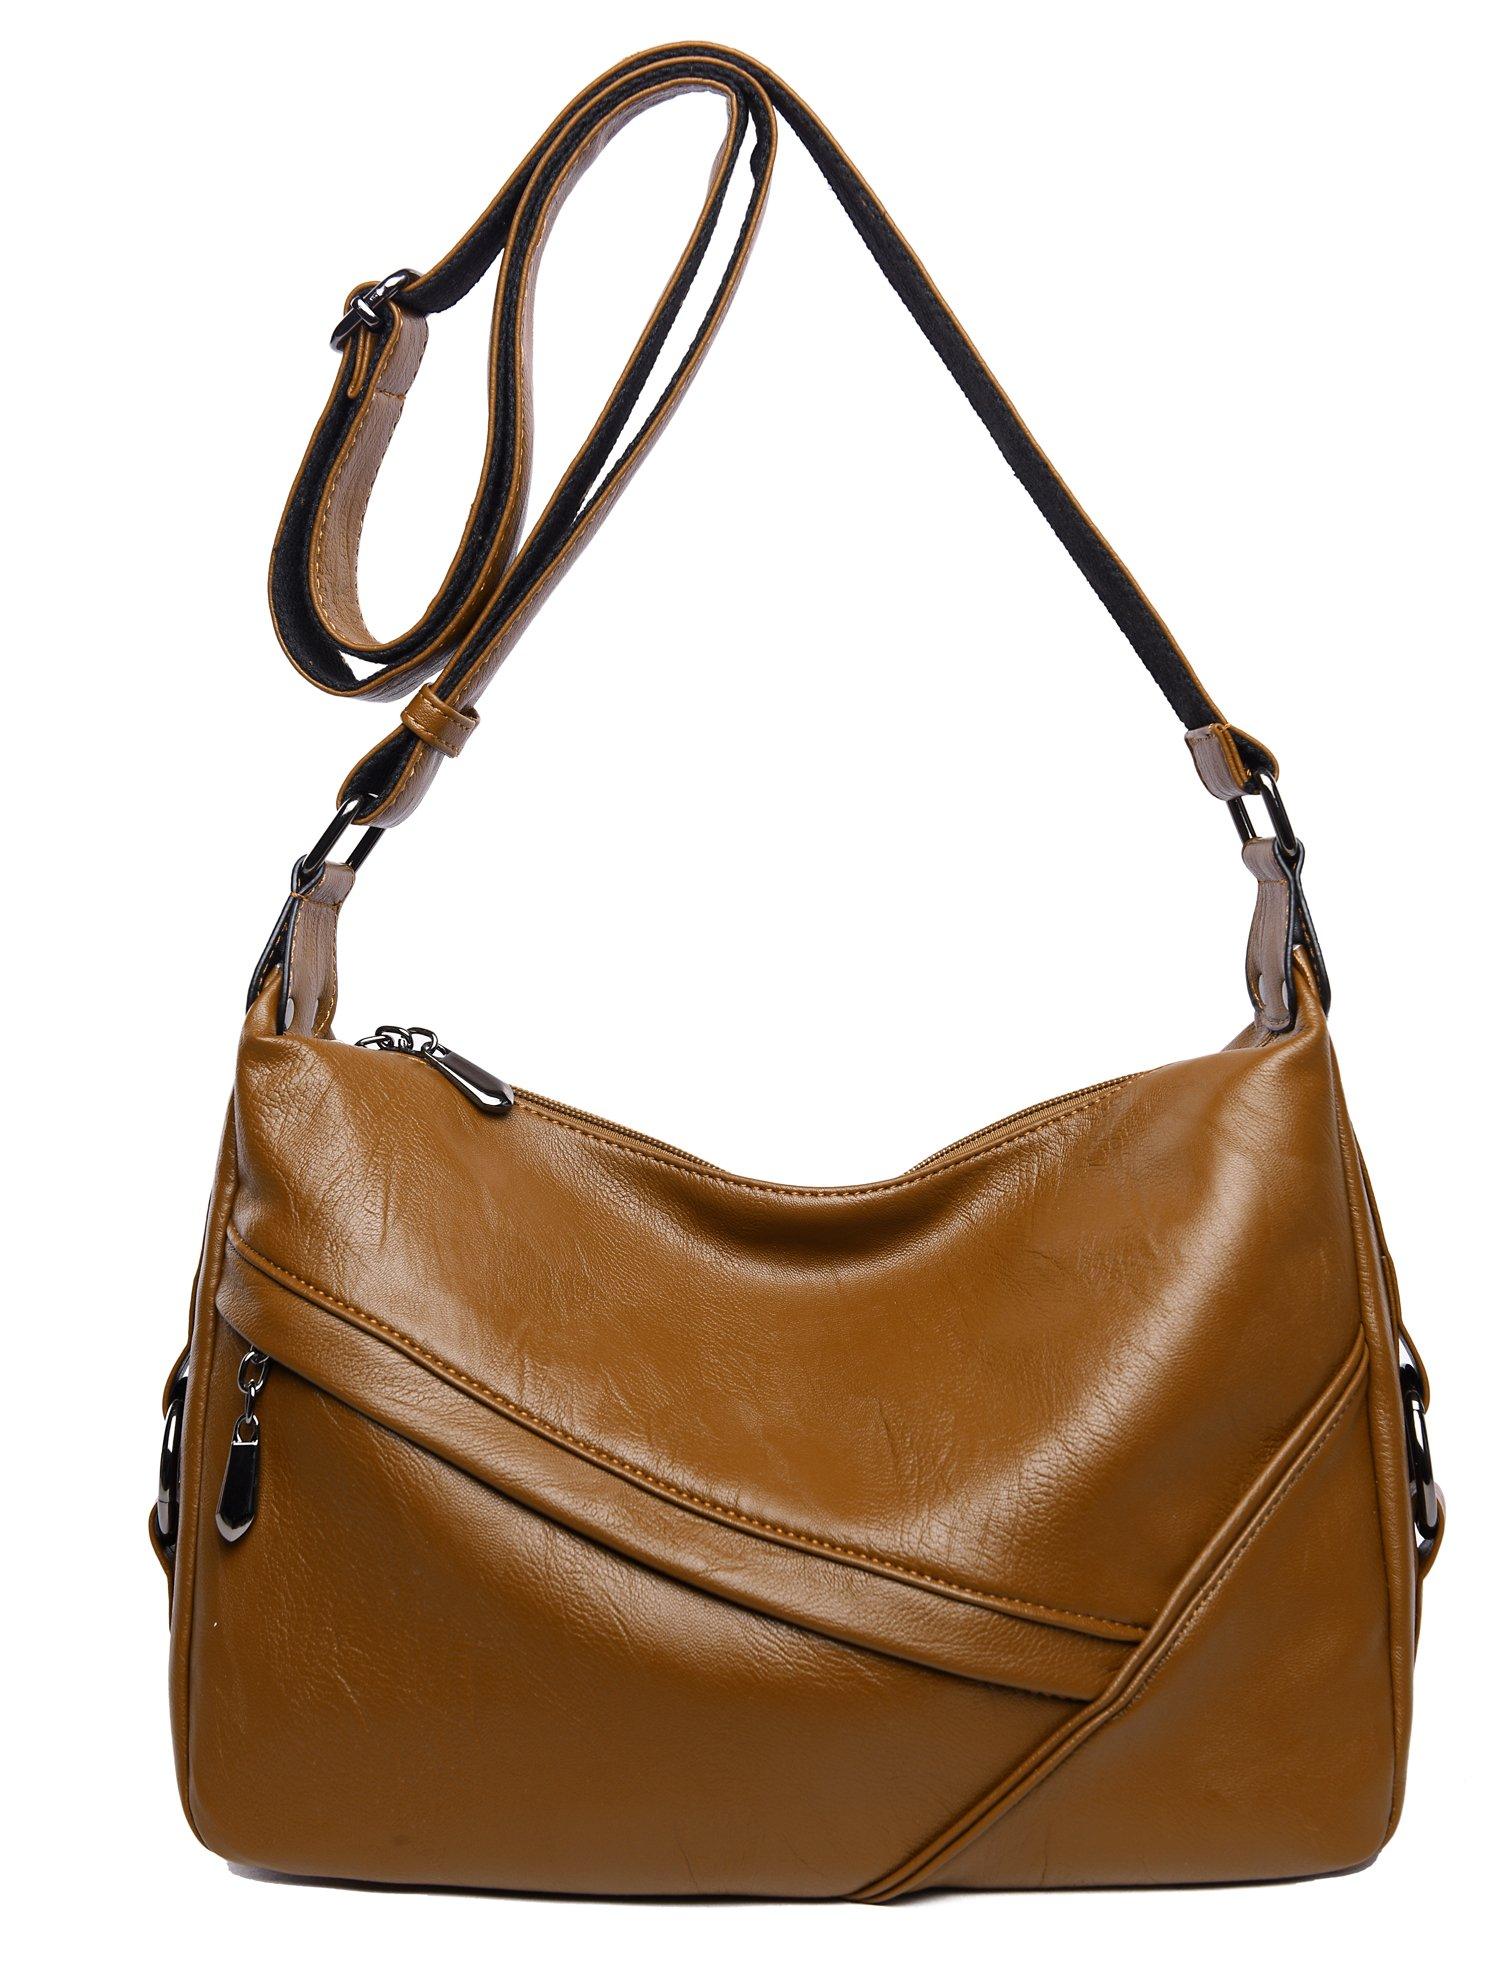 Women's Retro Sling Shoulder Bag from Covelin, Leather Crossbody Tote Handbag Brown